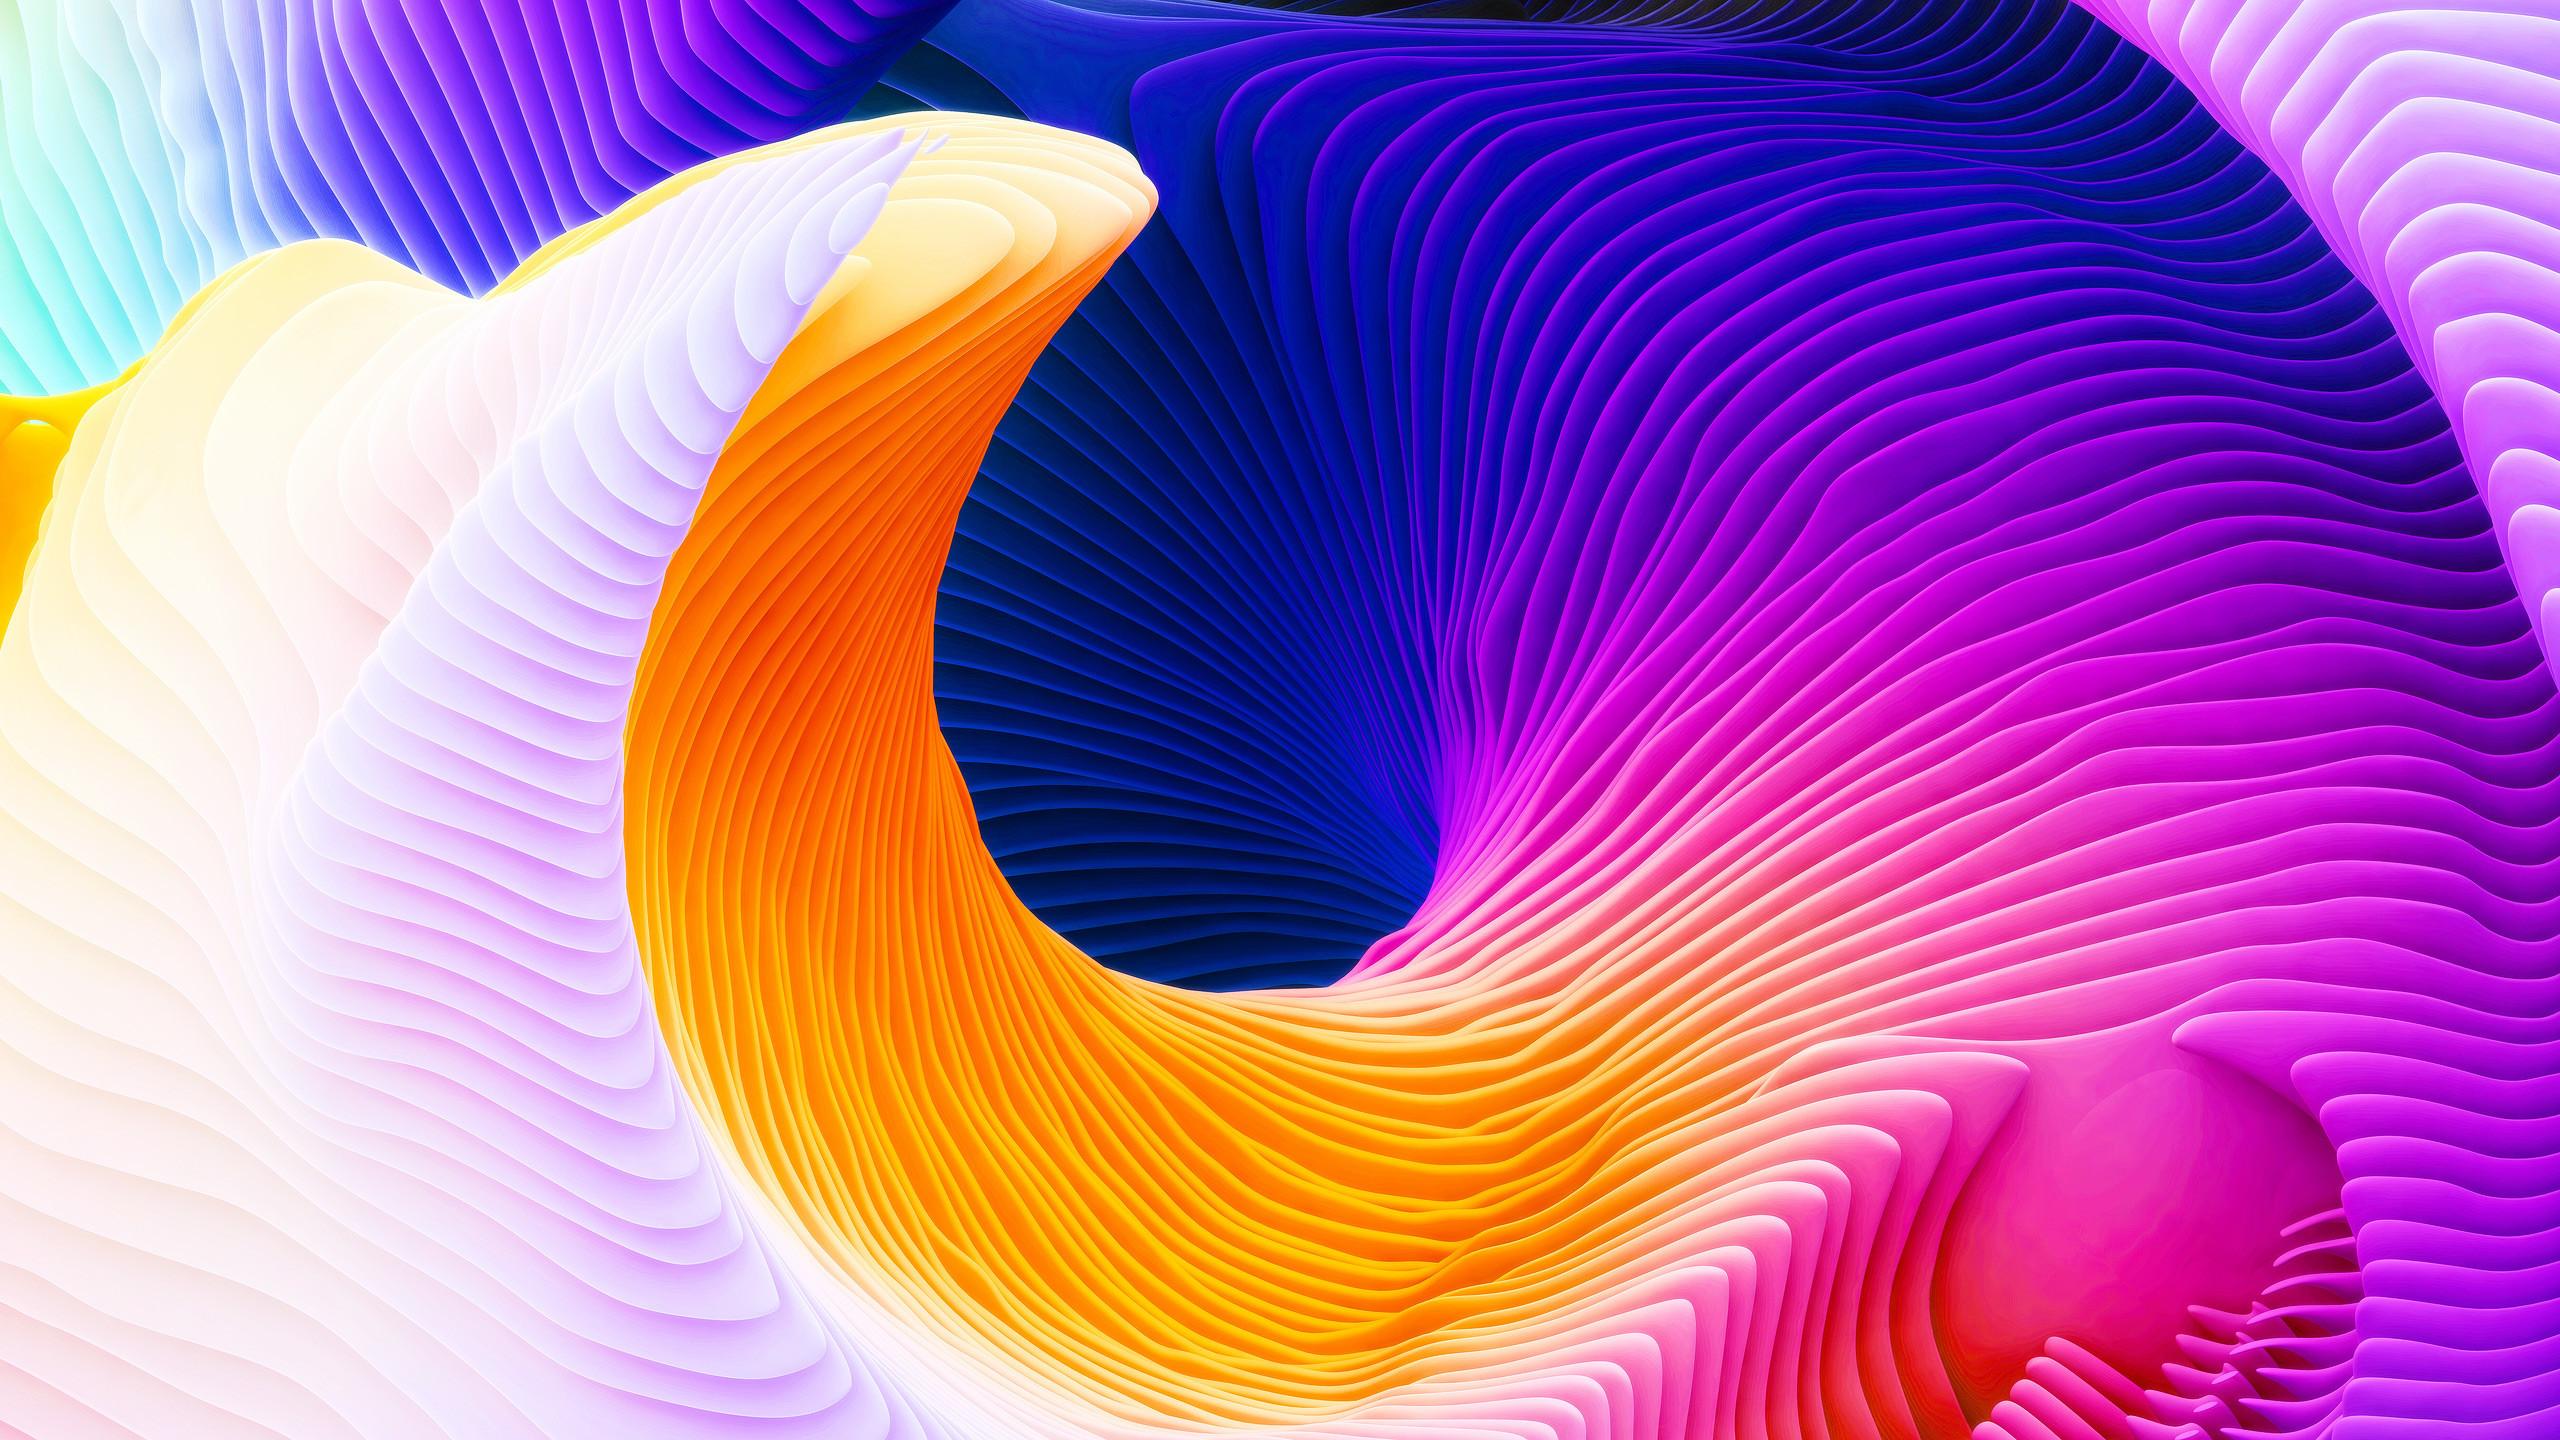 Abstract / Spiral Wallpaper